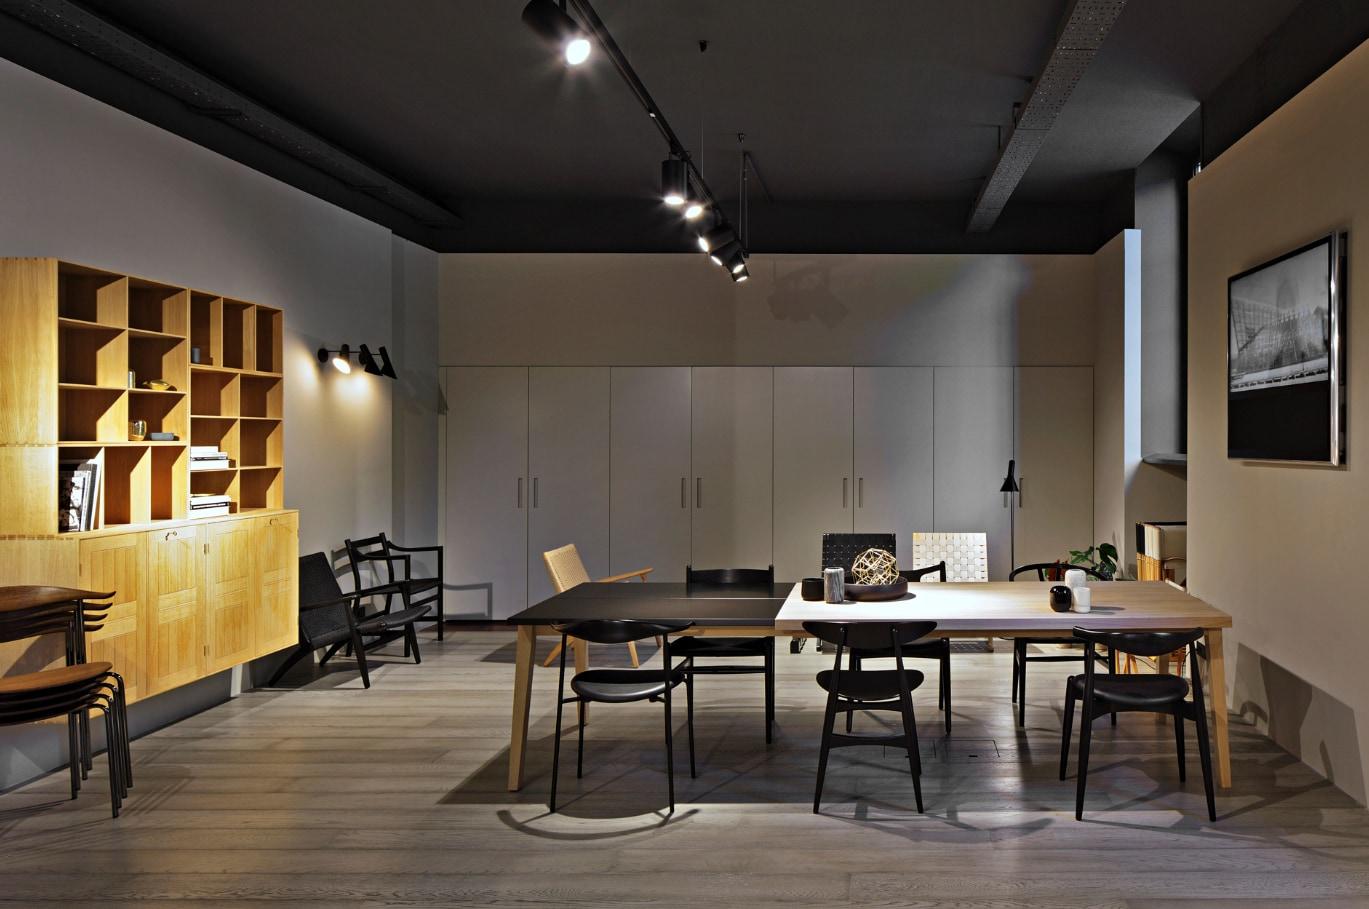 thonet apre il primo pop up caf a vienna interni magazine. Black Bedroom Furniture Sets. Home Design Ideas